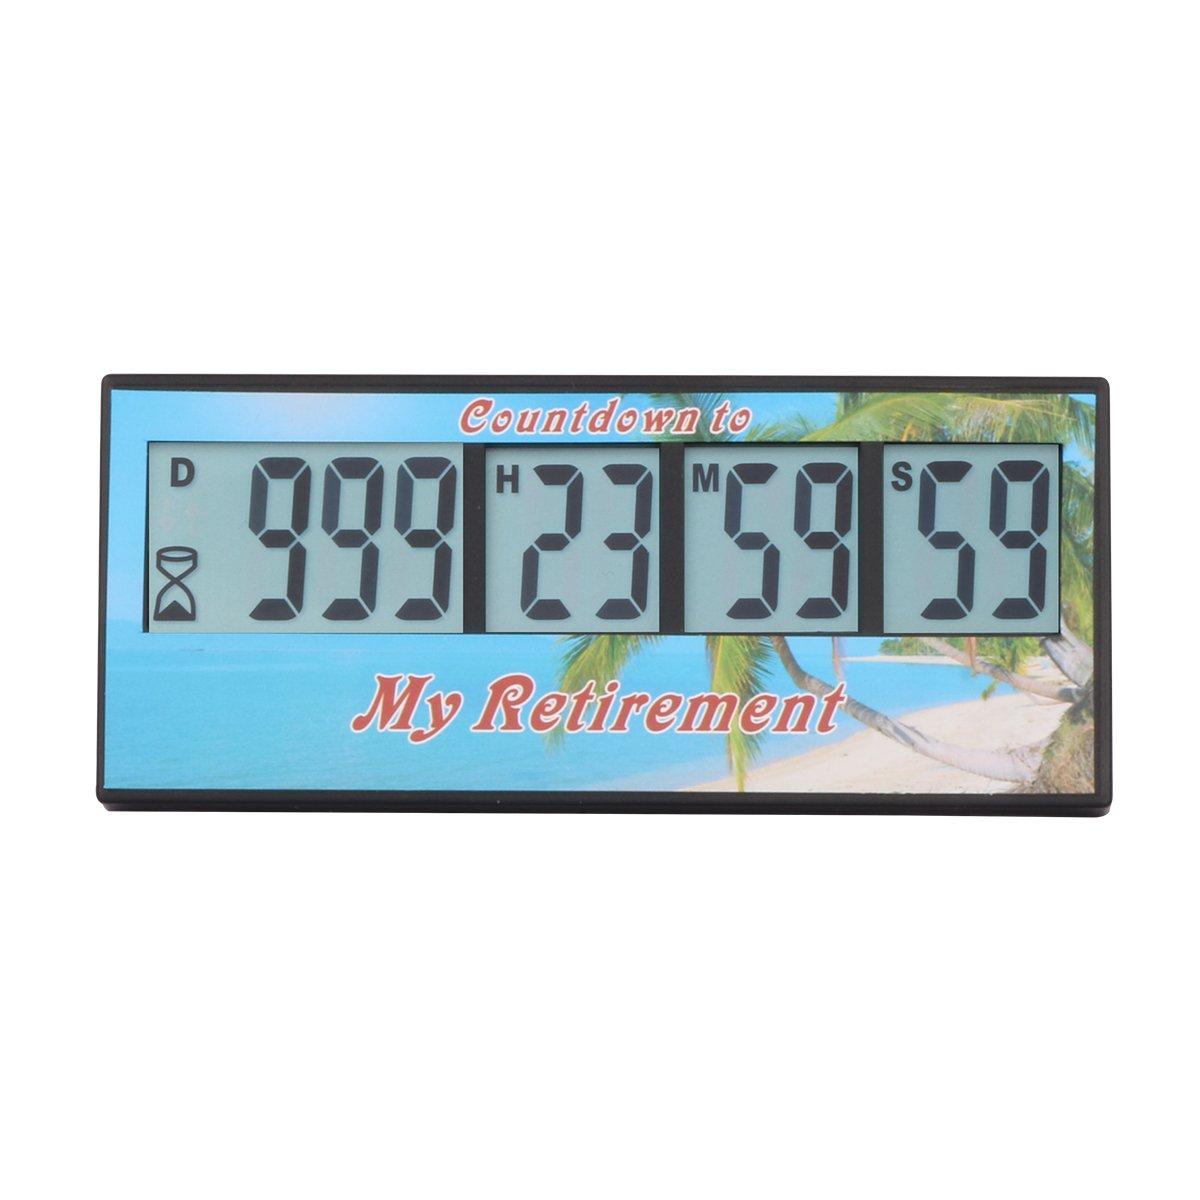 Digital Retirement Countdown Timer - AIMILAR 999 Days Count Down Timer (3-Year Warranty)